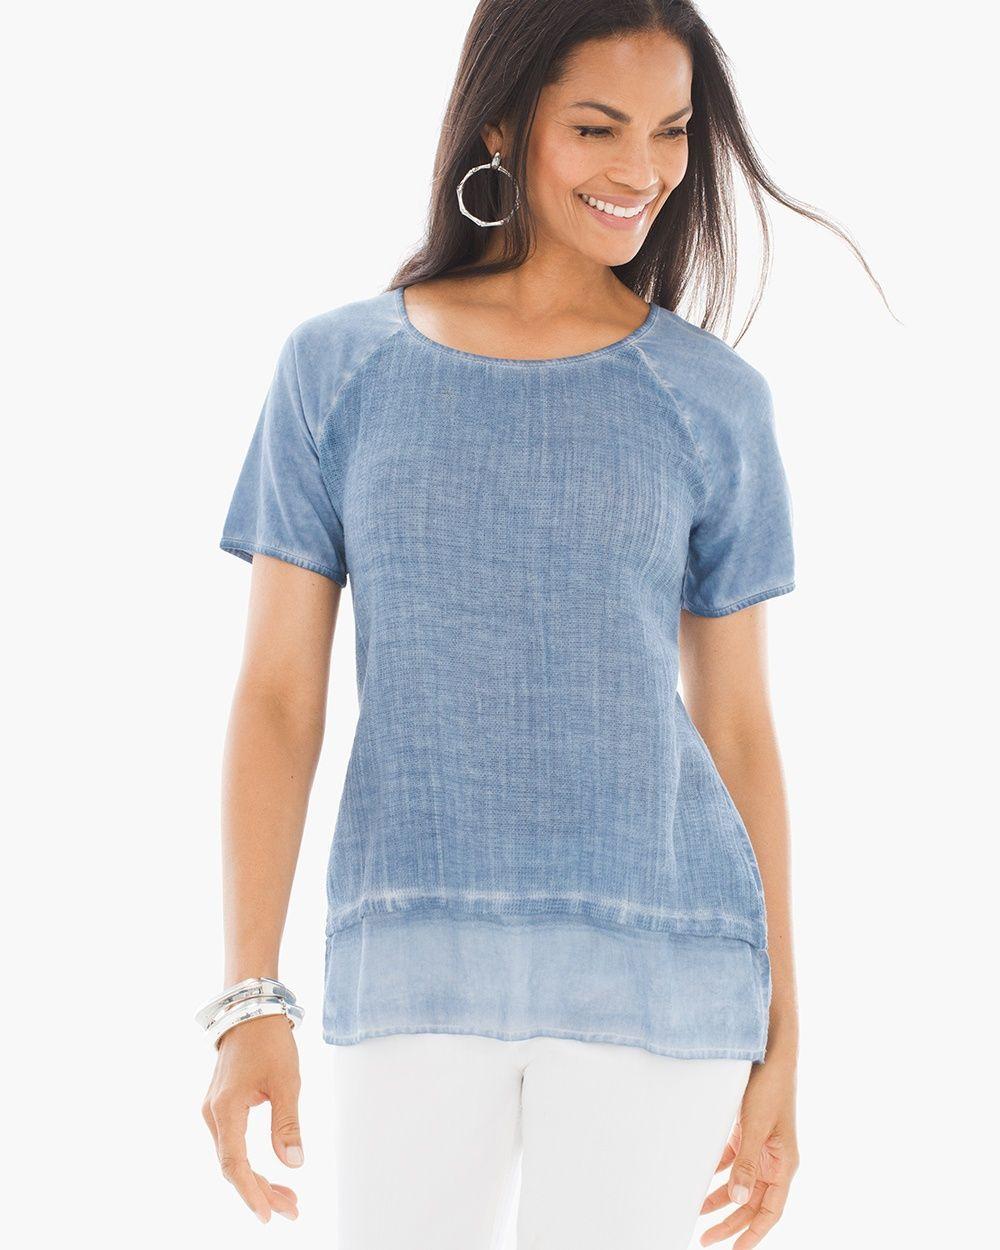 GauzeKnit Top Tops, Women, Clothes